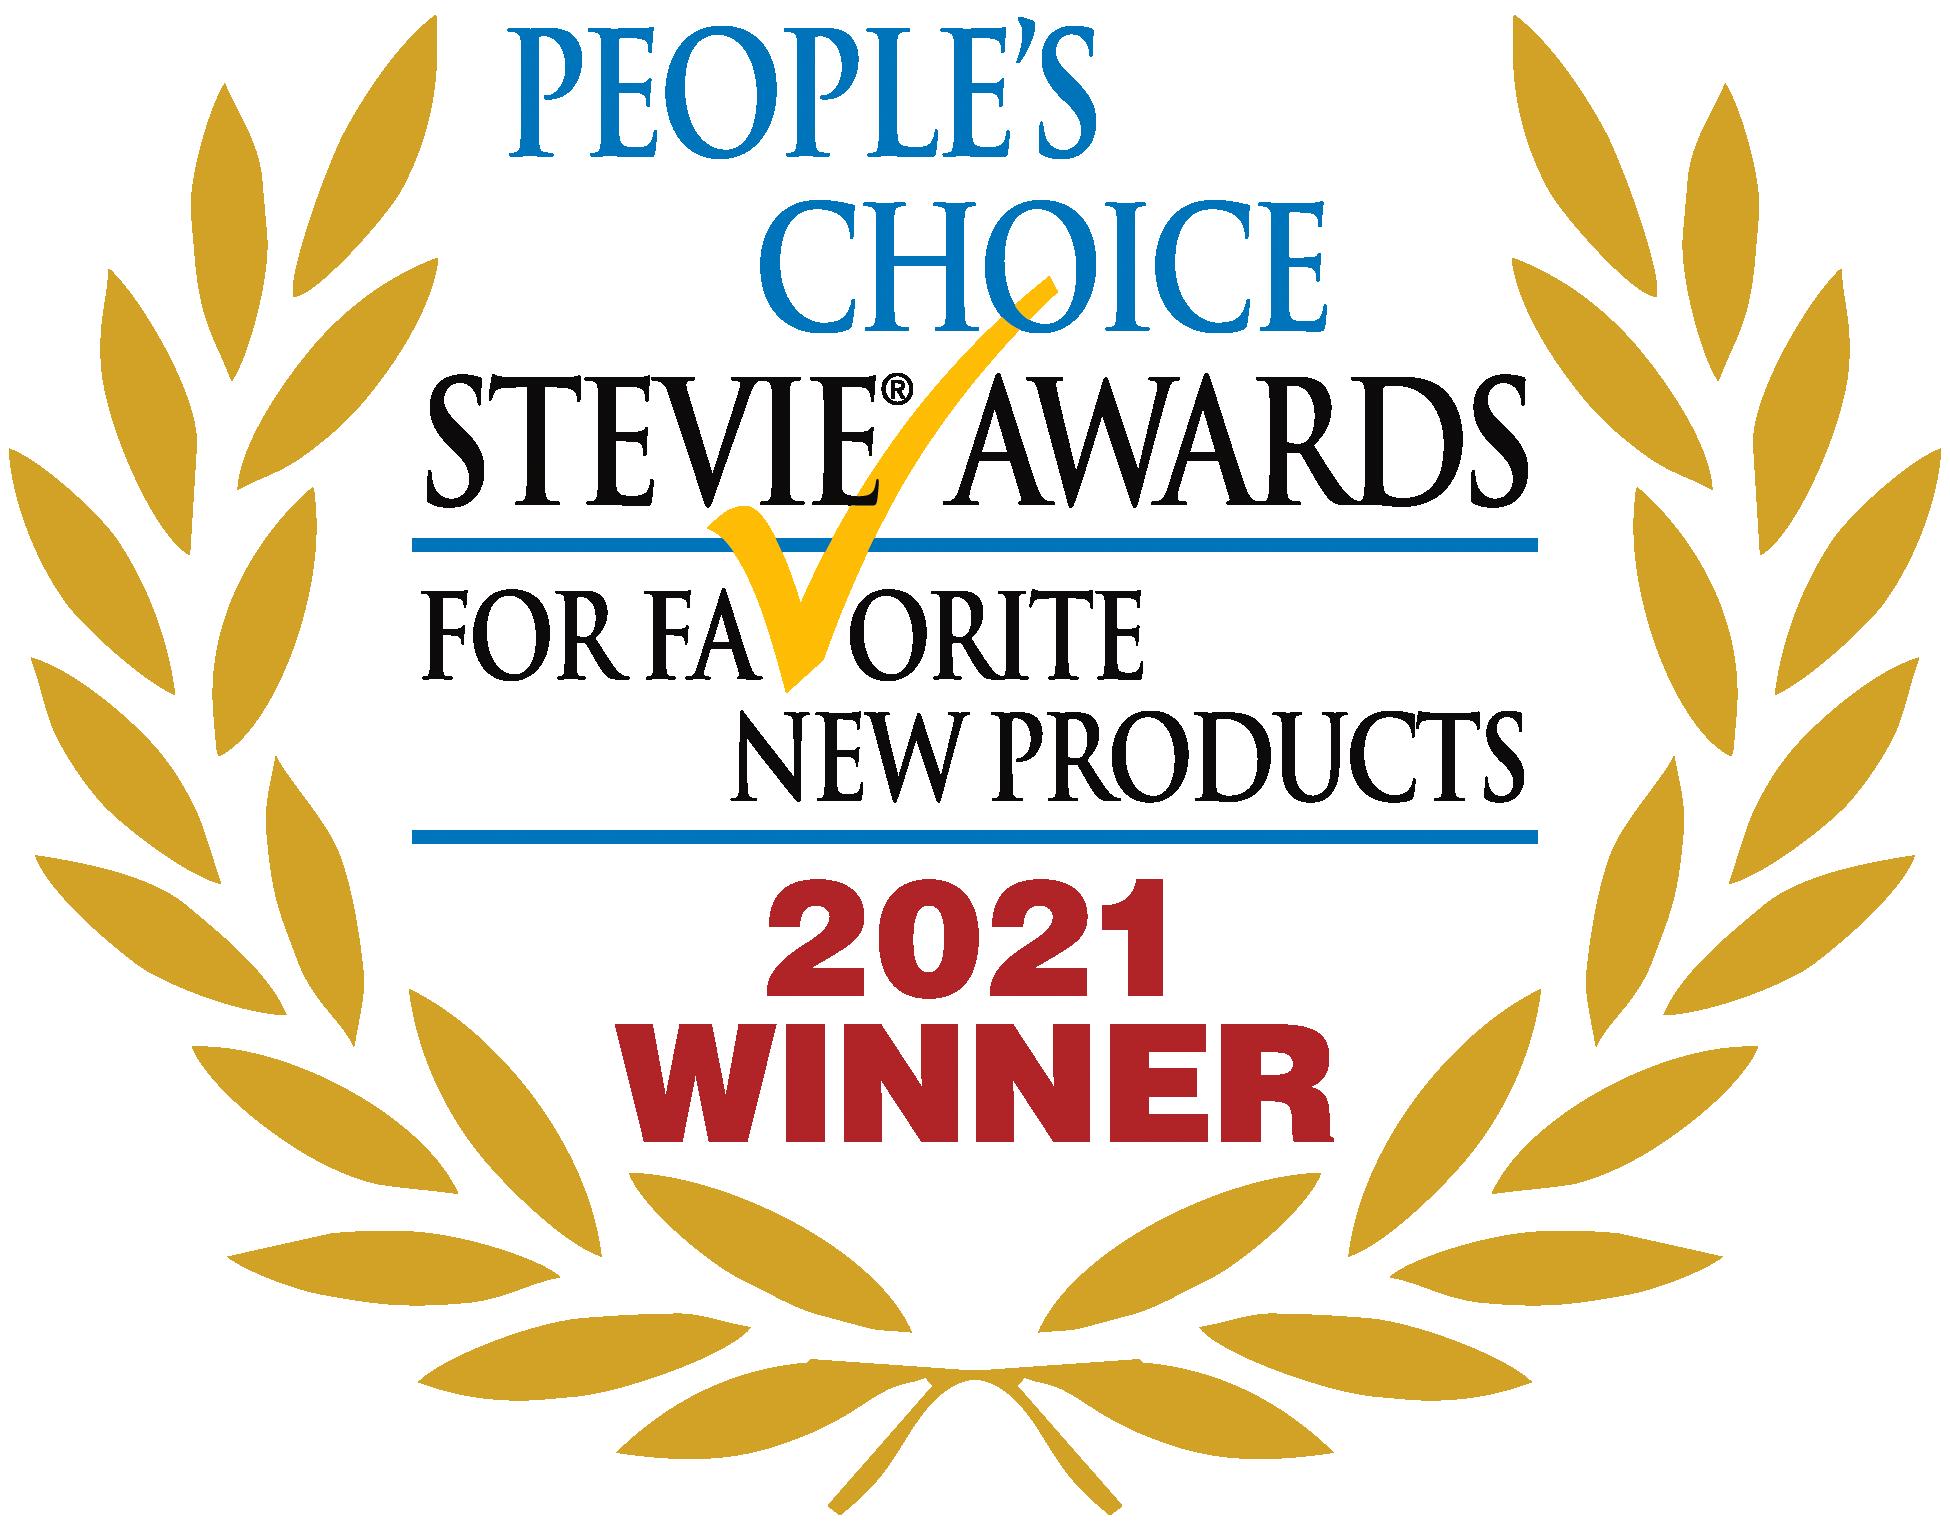 Birdeye Wins 2021 Best Cloud Platform People S Choice Stevie Award 1622745341025